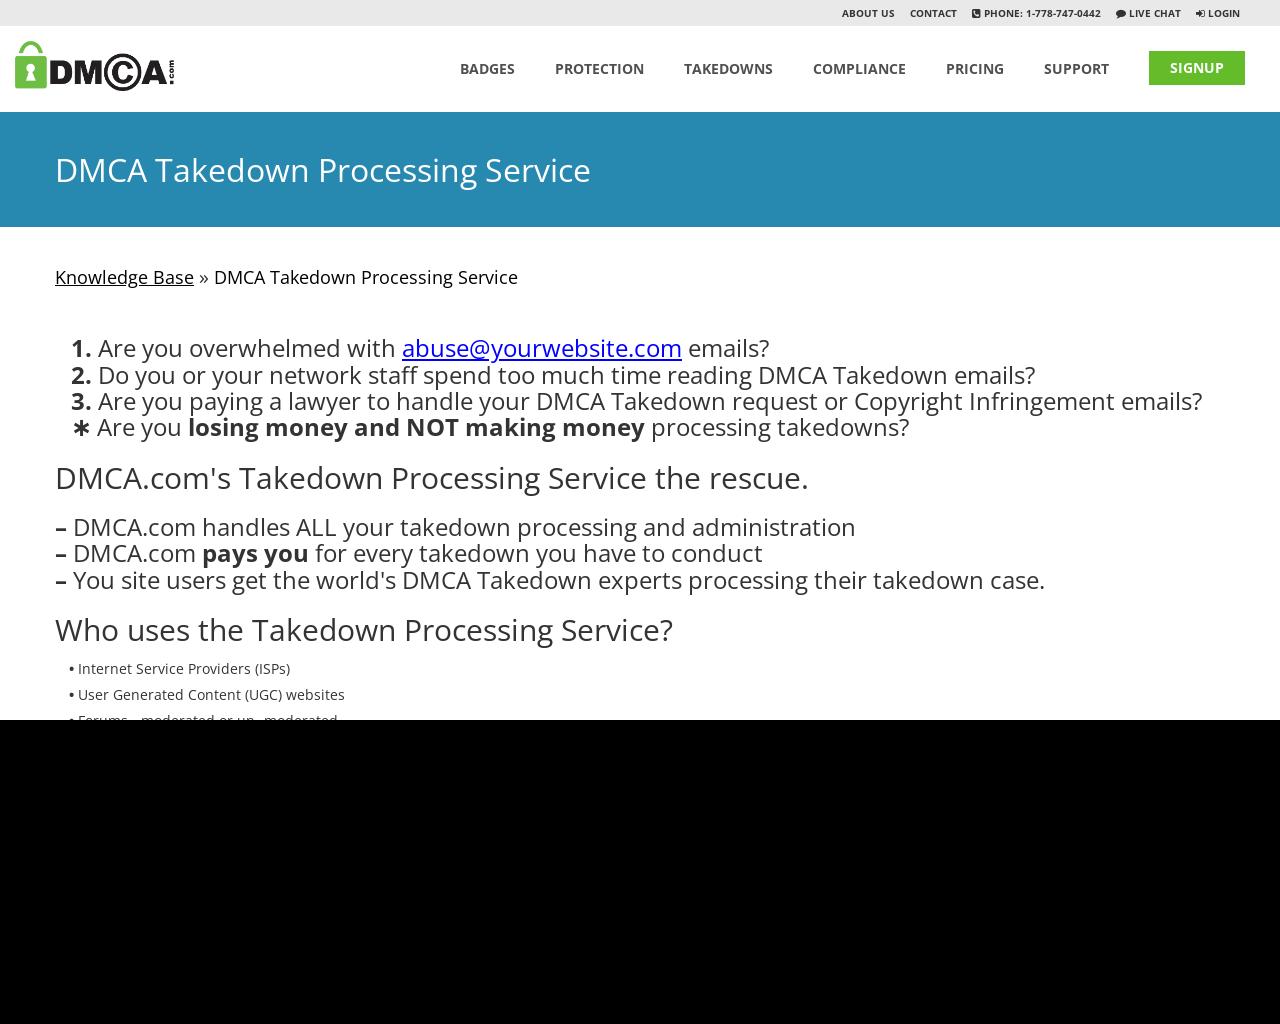 Dmca Takedown Processing Service